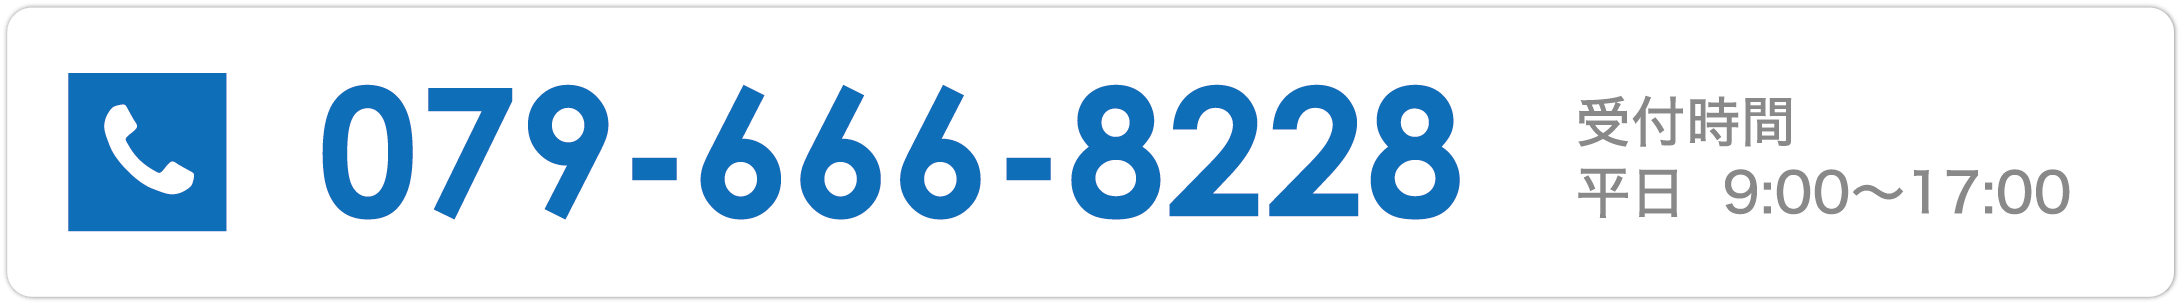 079-666-8228